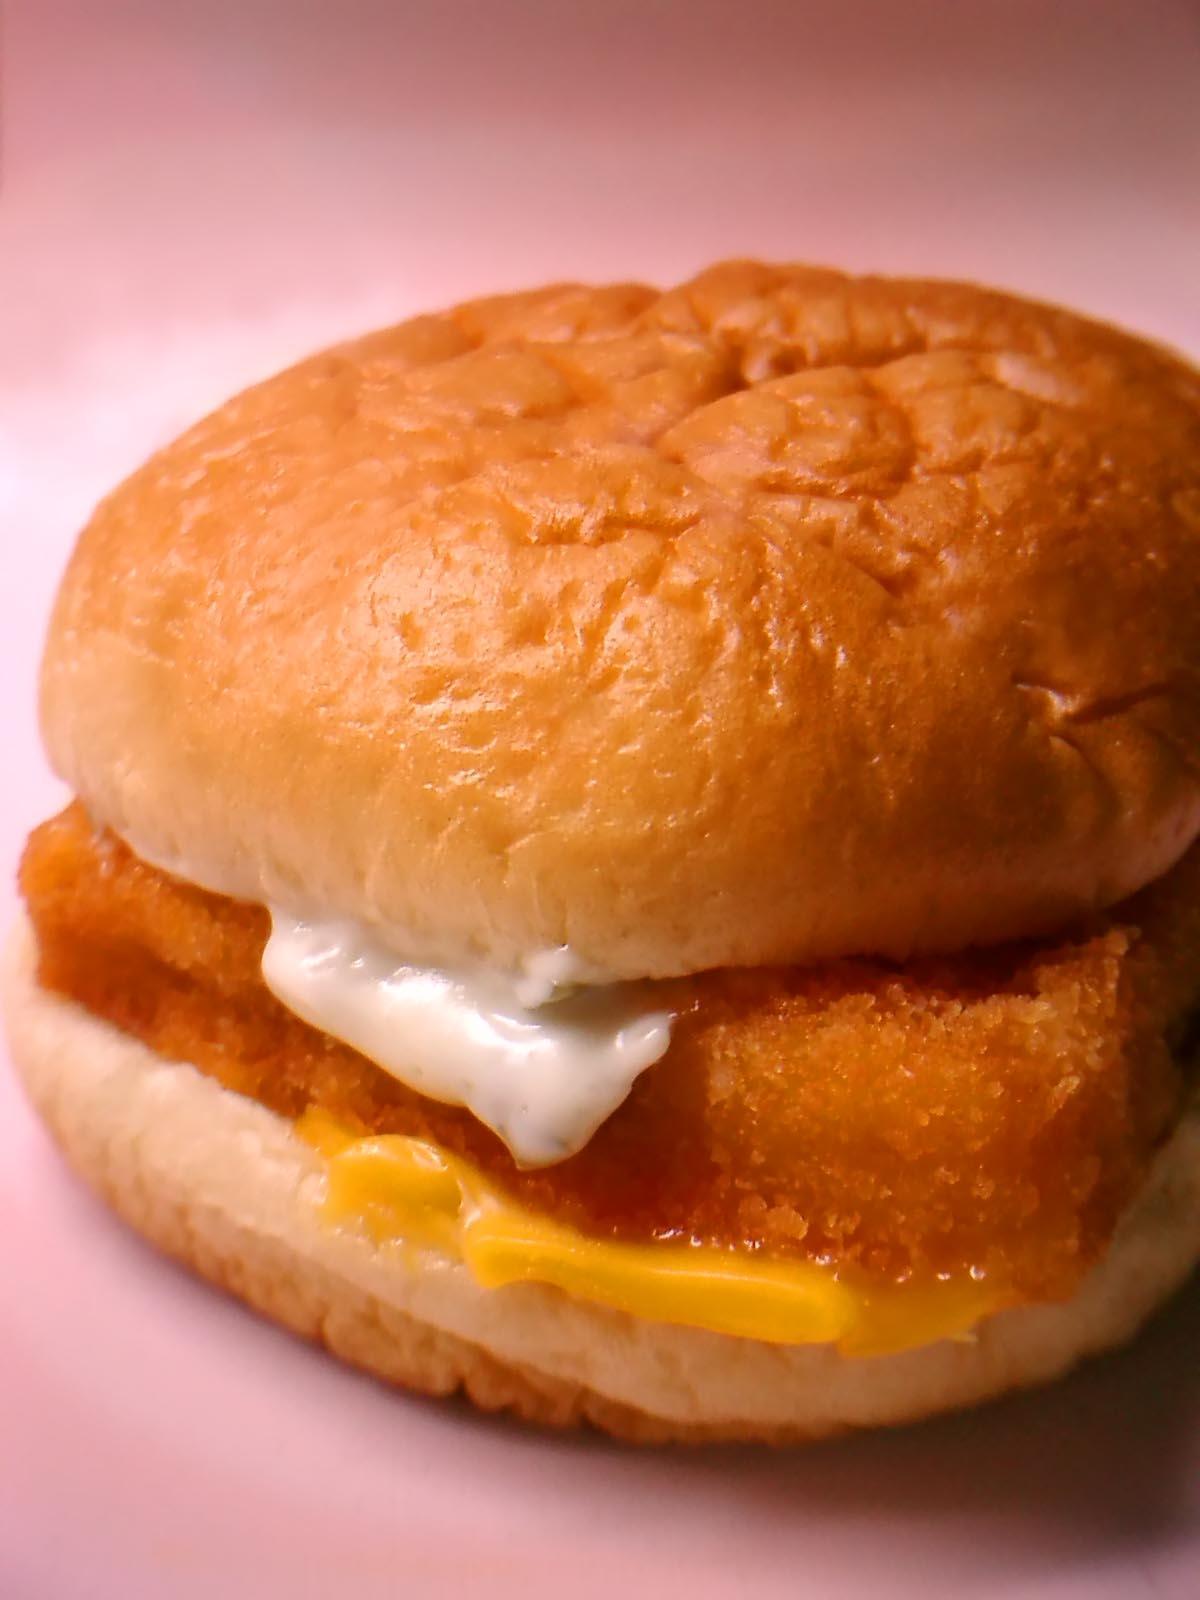 Filet o fish wikidata for Mcdonald s fish sandwich price